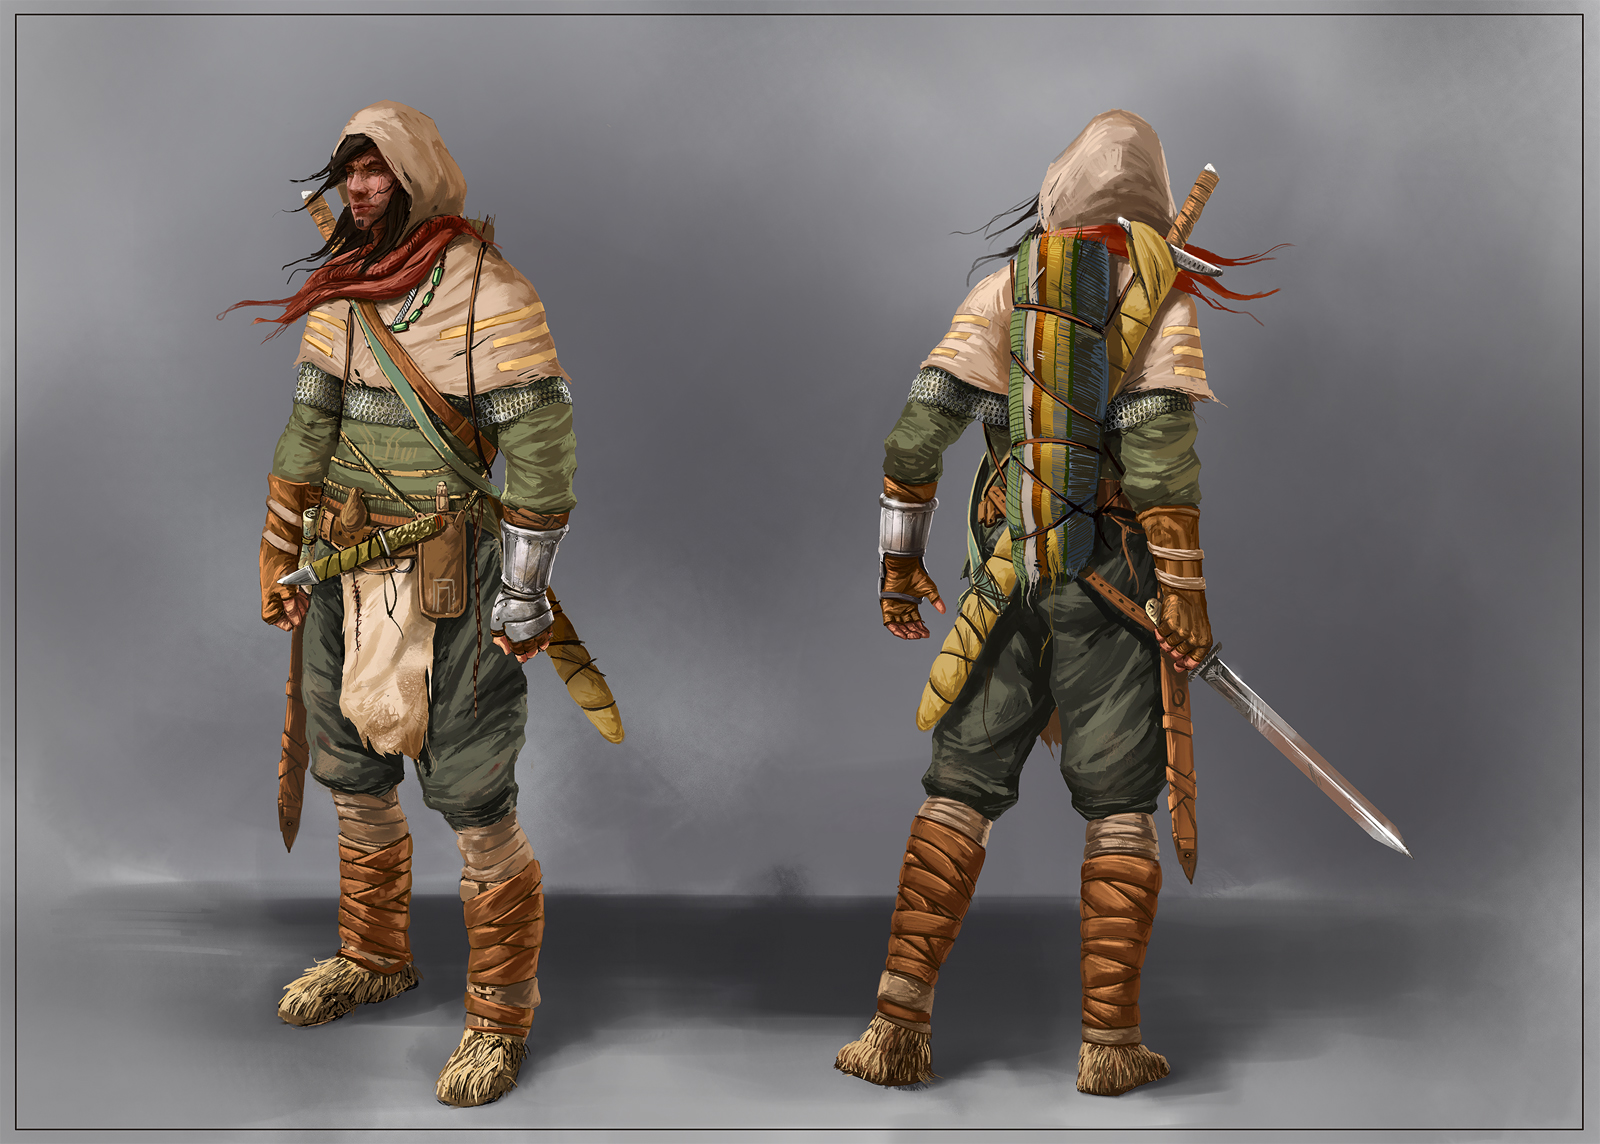 Nomad warrior by Sickbrush